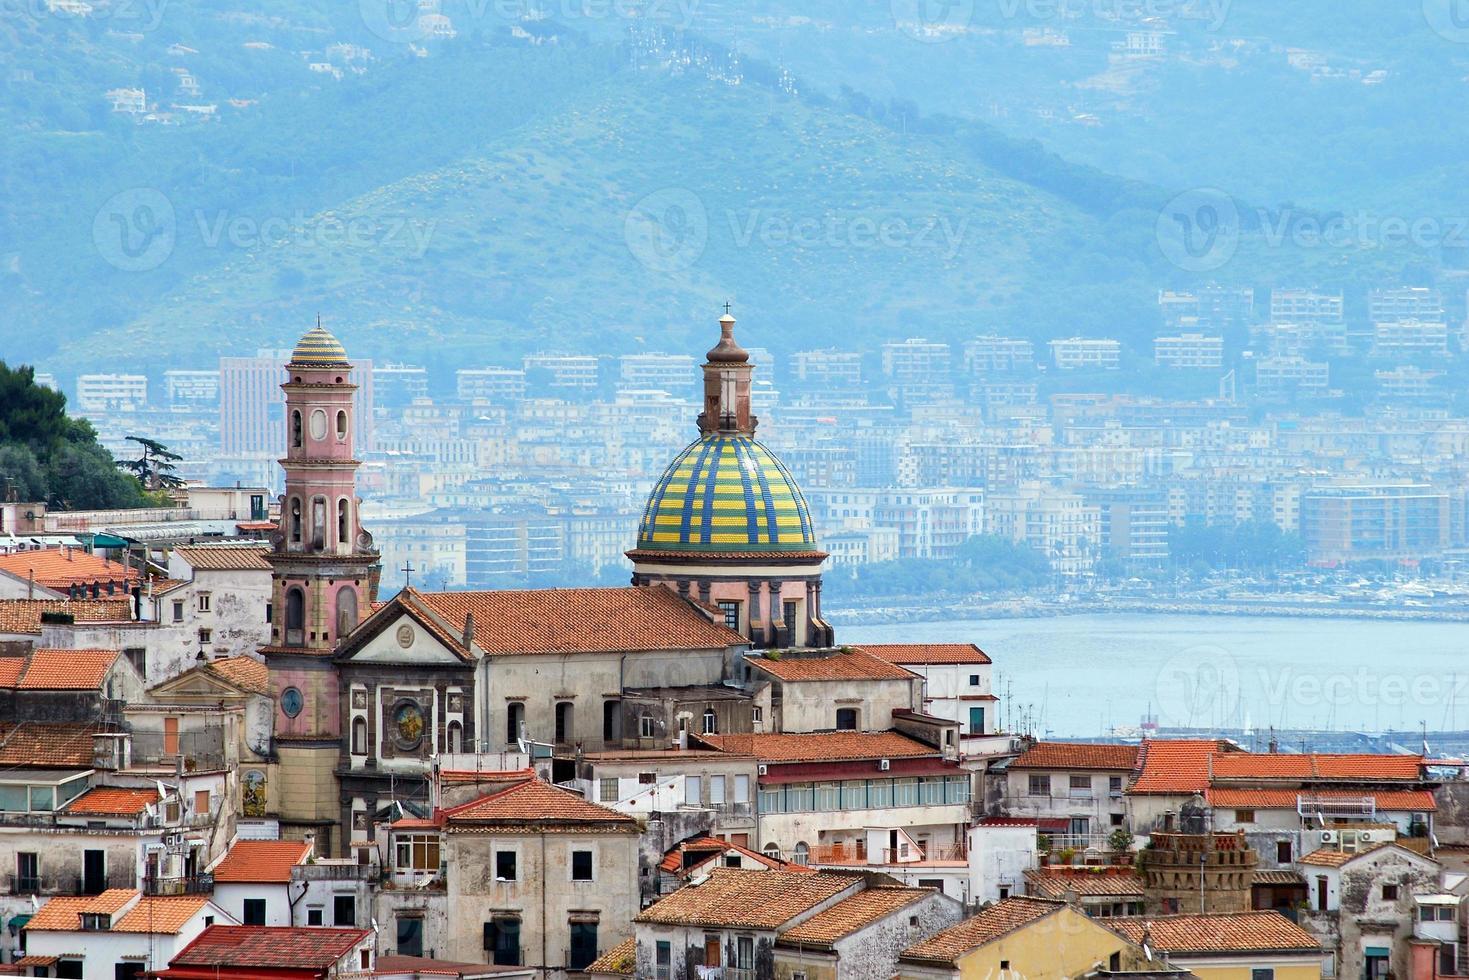 côte amalfitaine, ville vietri sul mare photo